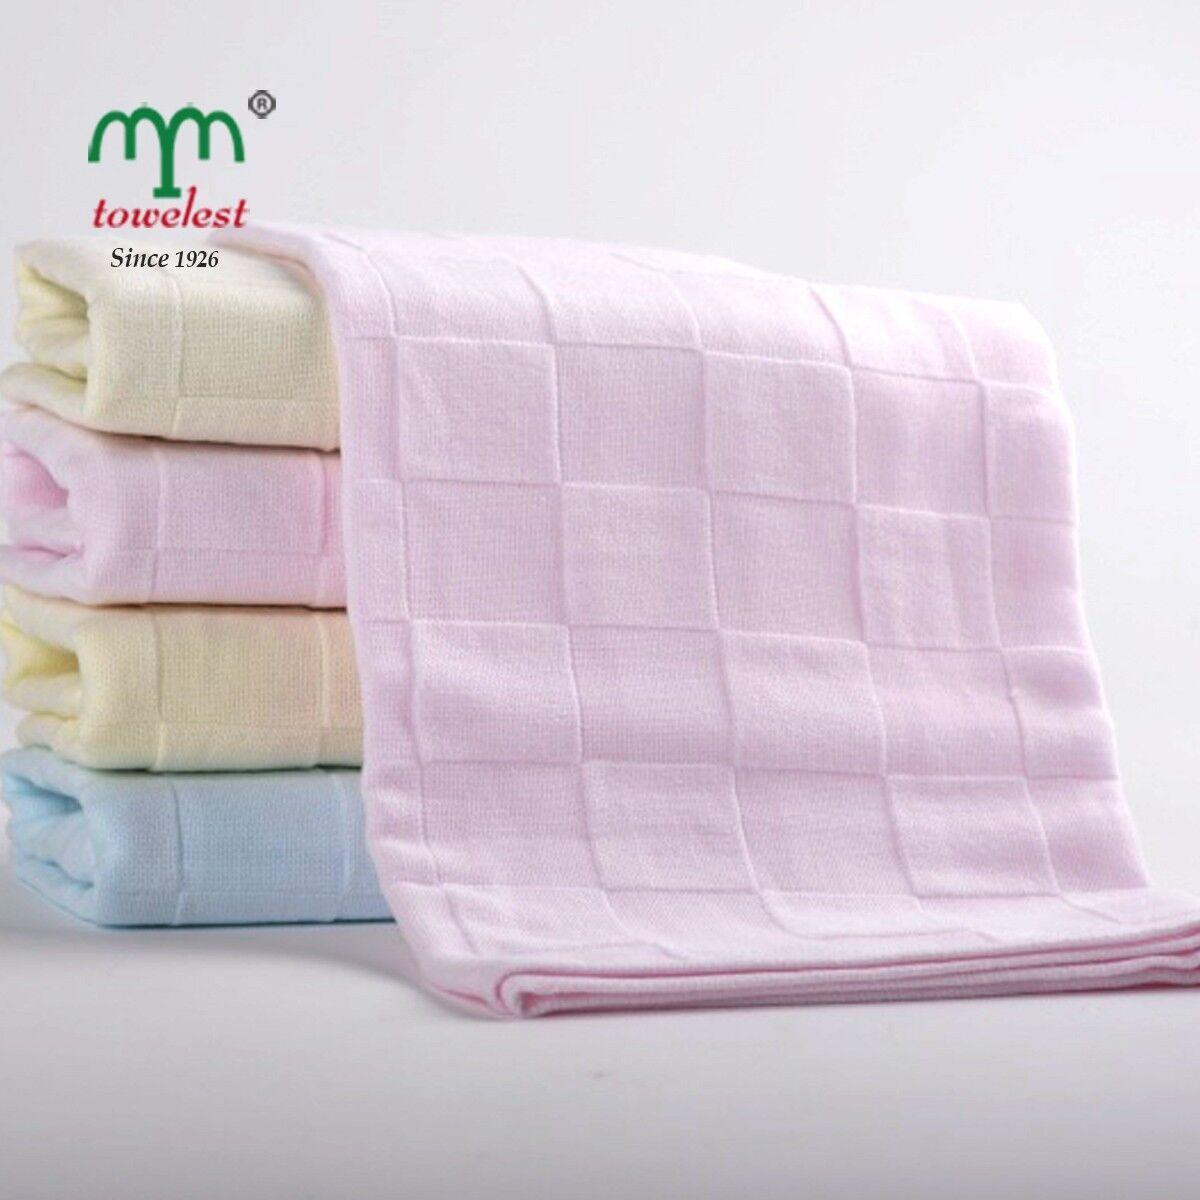 Bulk Dish Towels For Sale: 6PC MMY Brand Cotton Hand Towels Muslin Baby Bibs Bulk